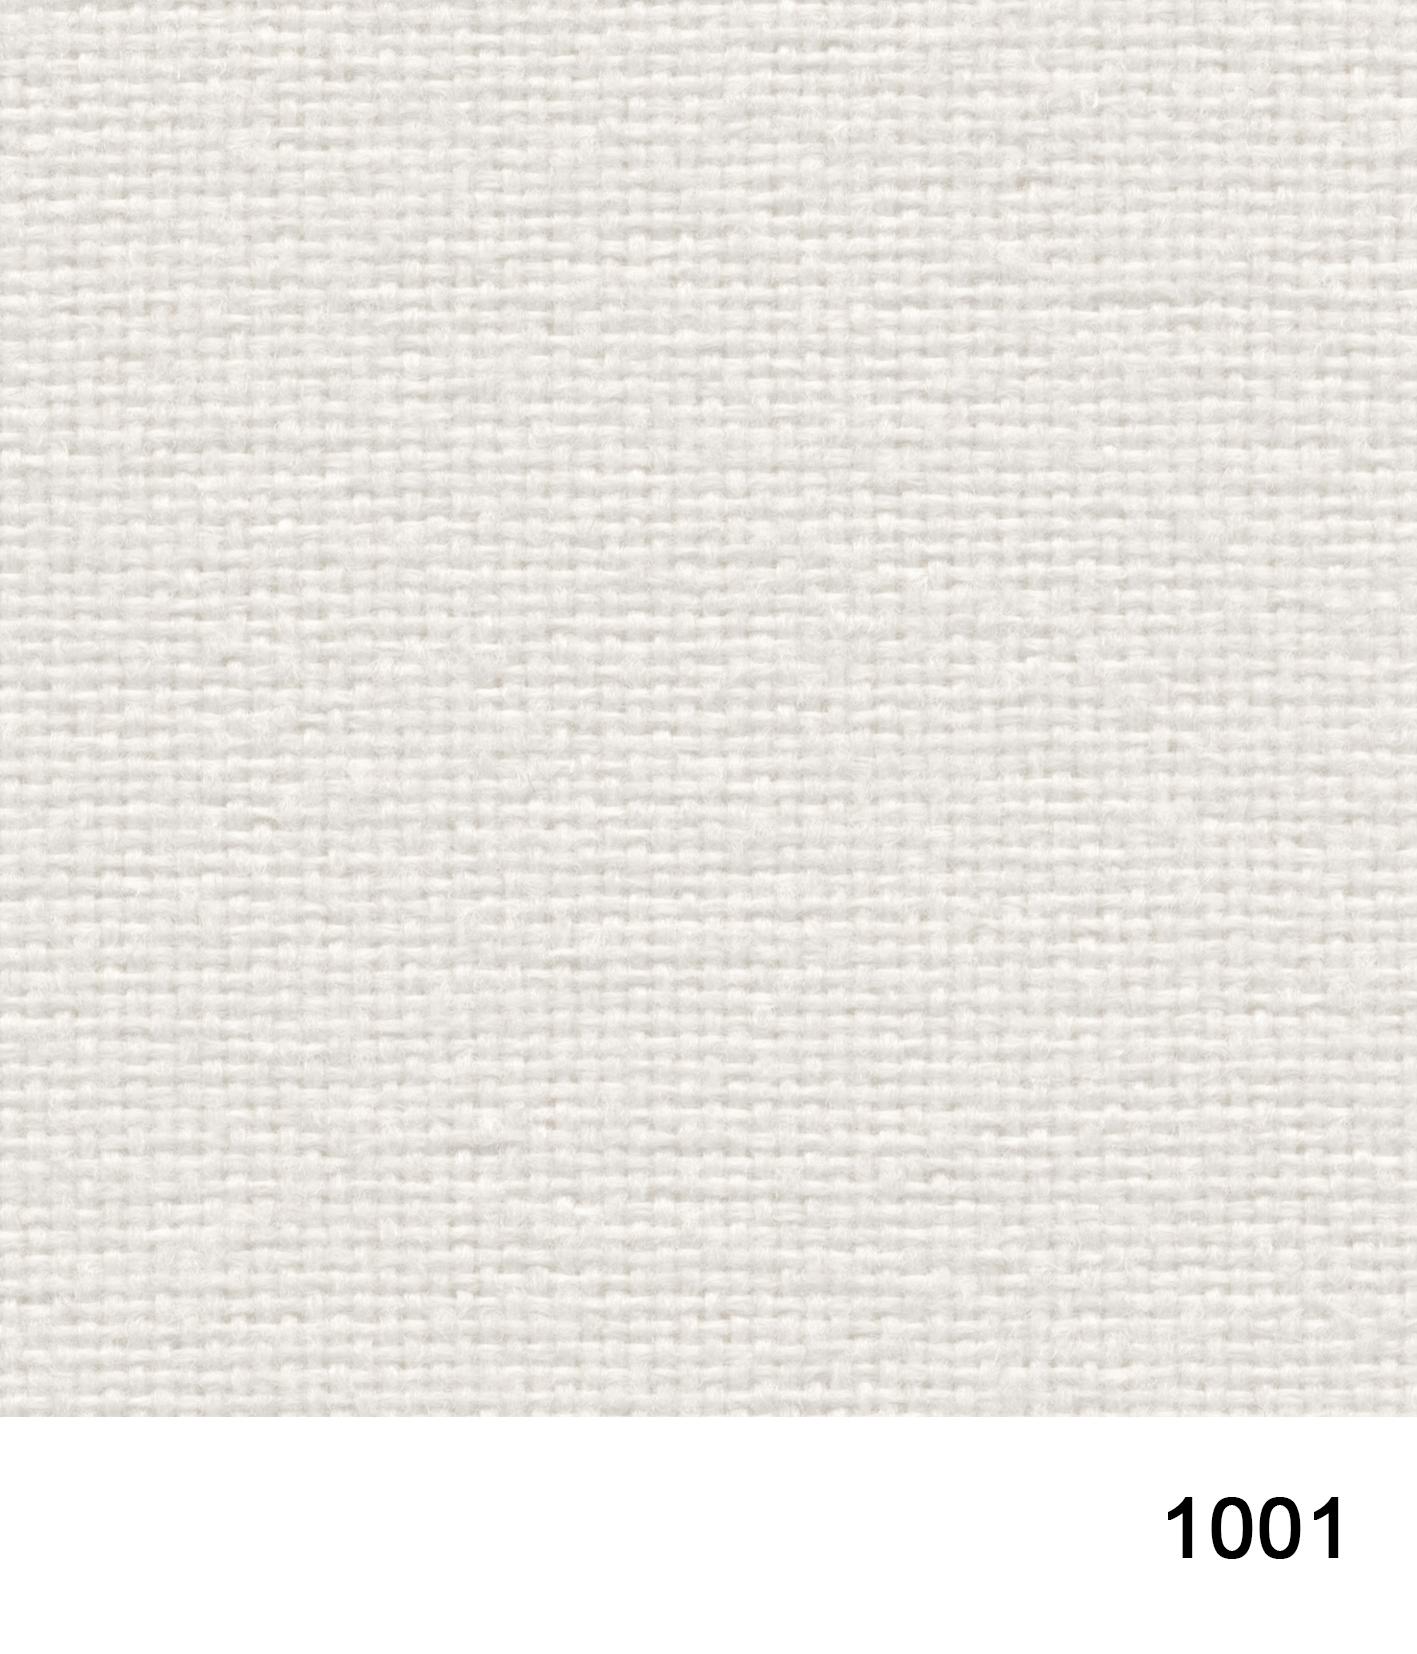 JET BIOACTIVE 3158